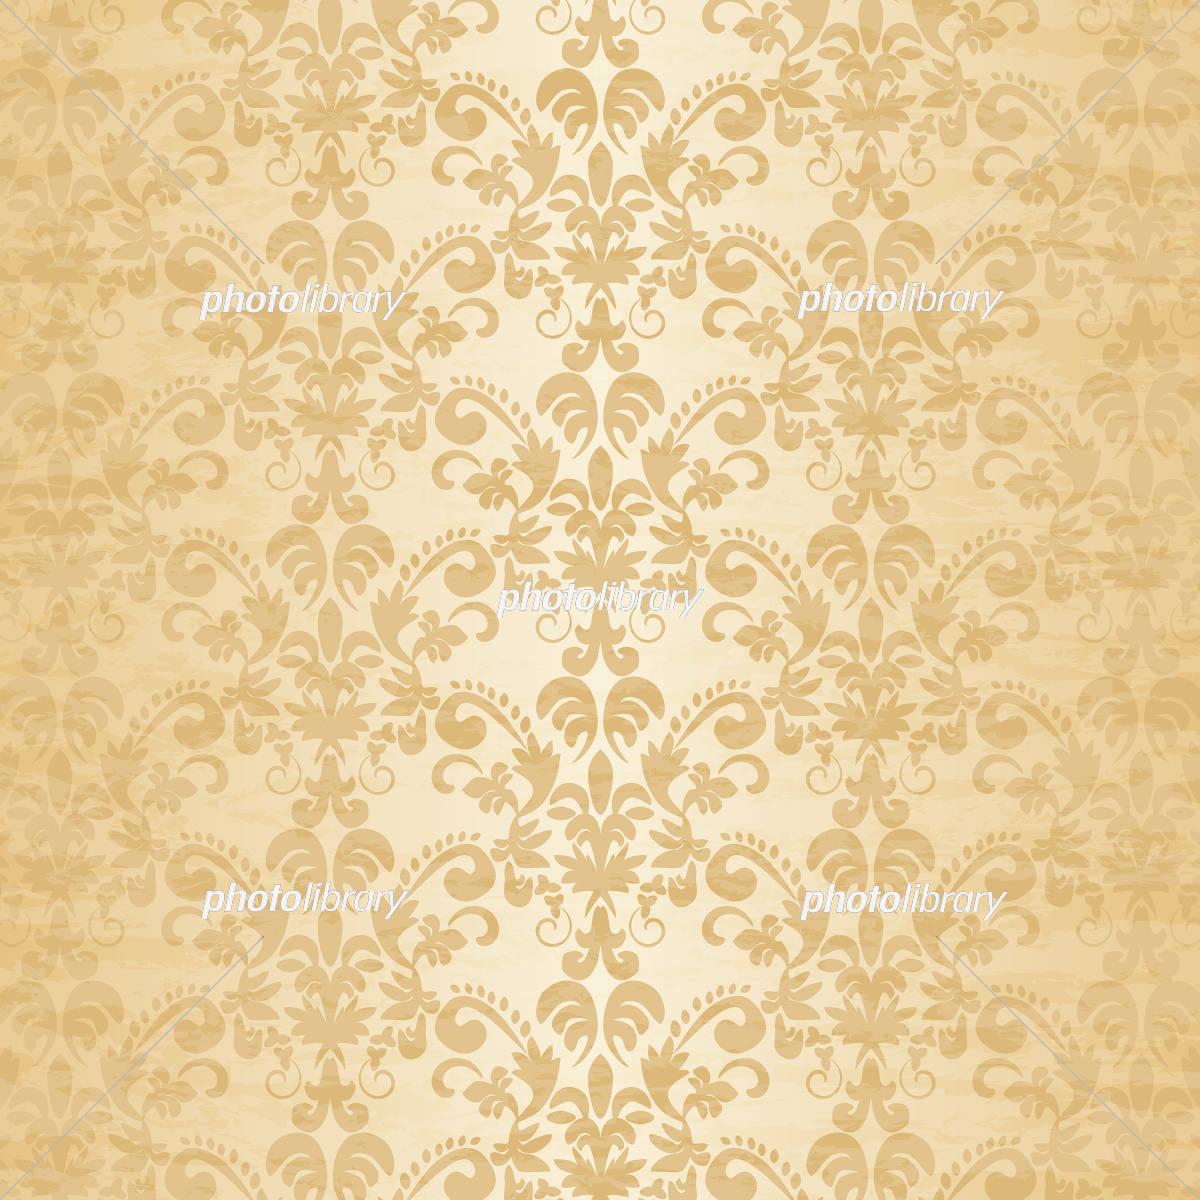 Vintage pattern イラスト素材